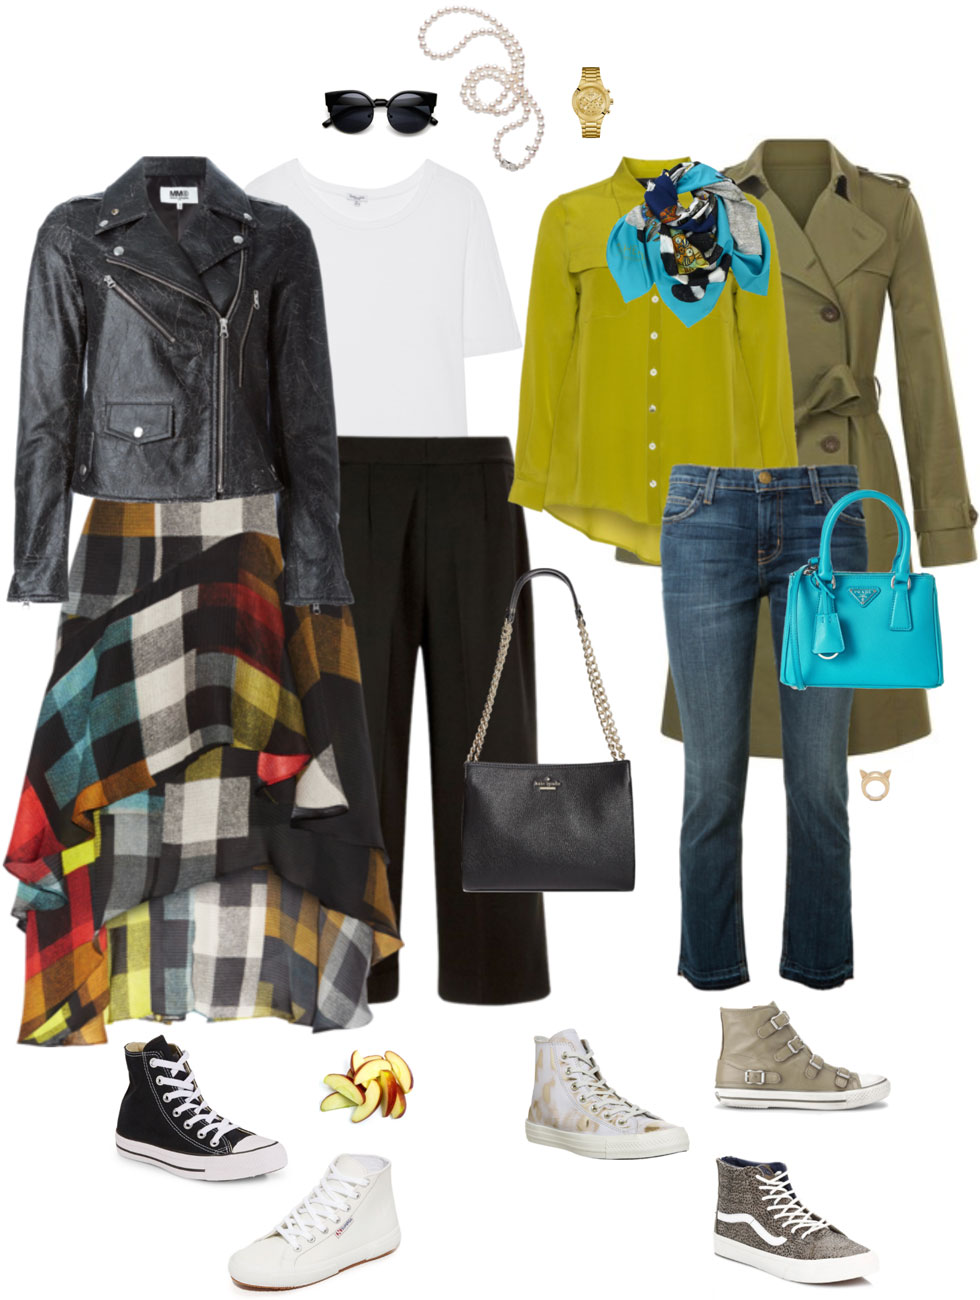 Ensemble Style Advice - Dressed Up Hi-Tops